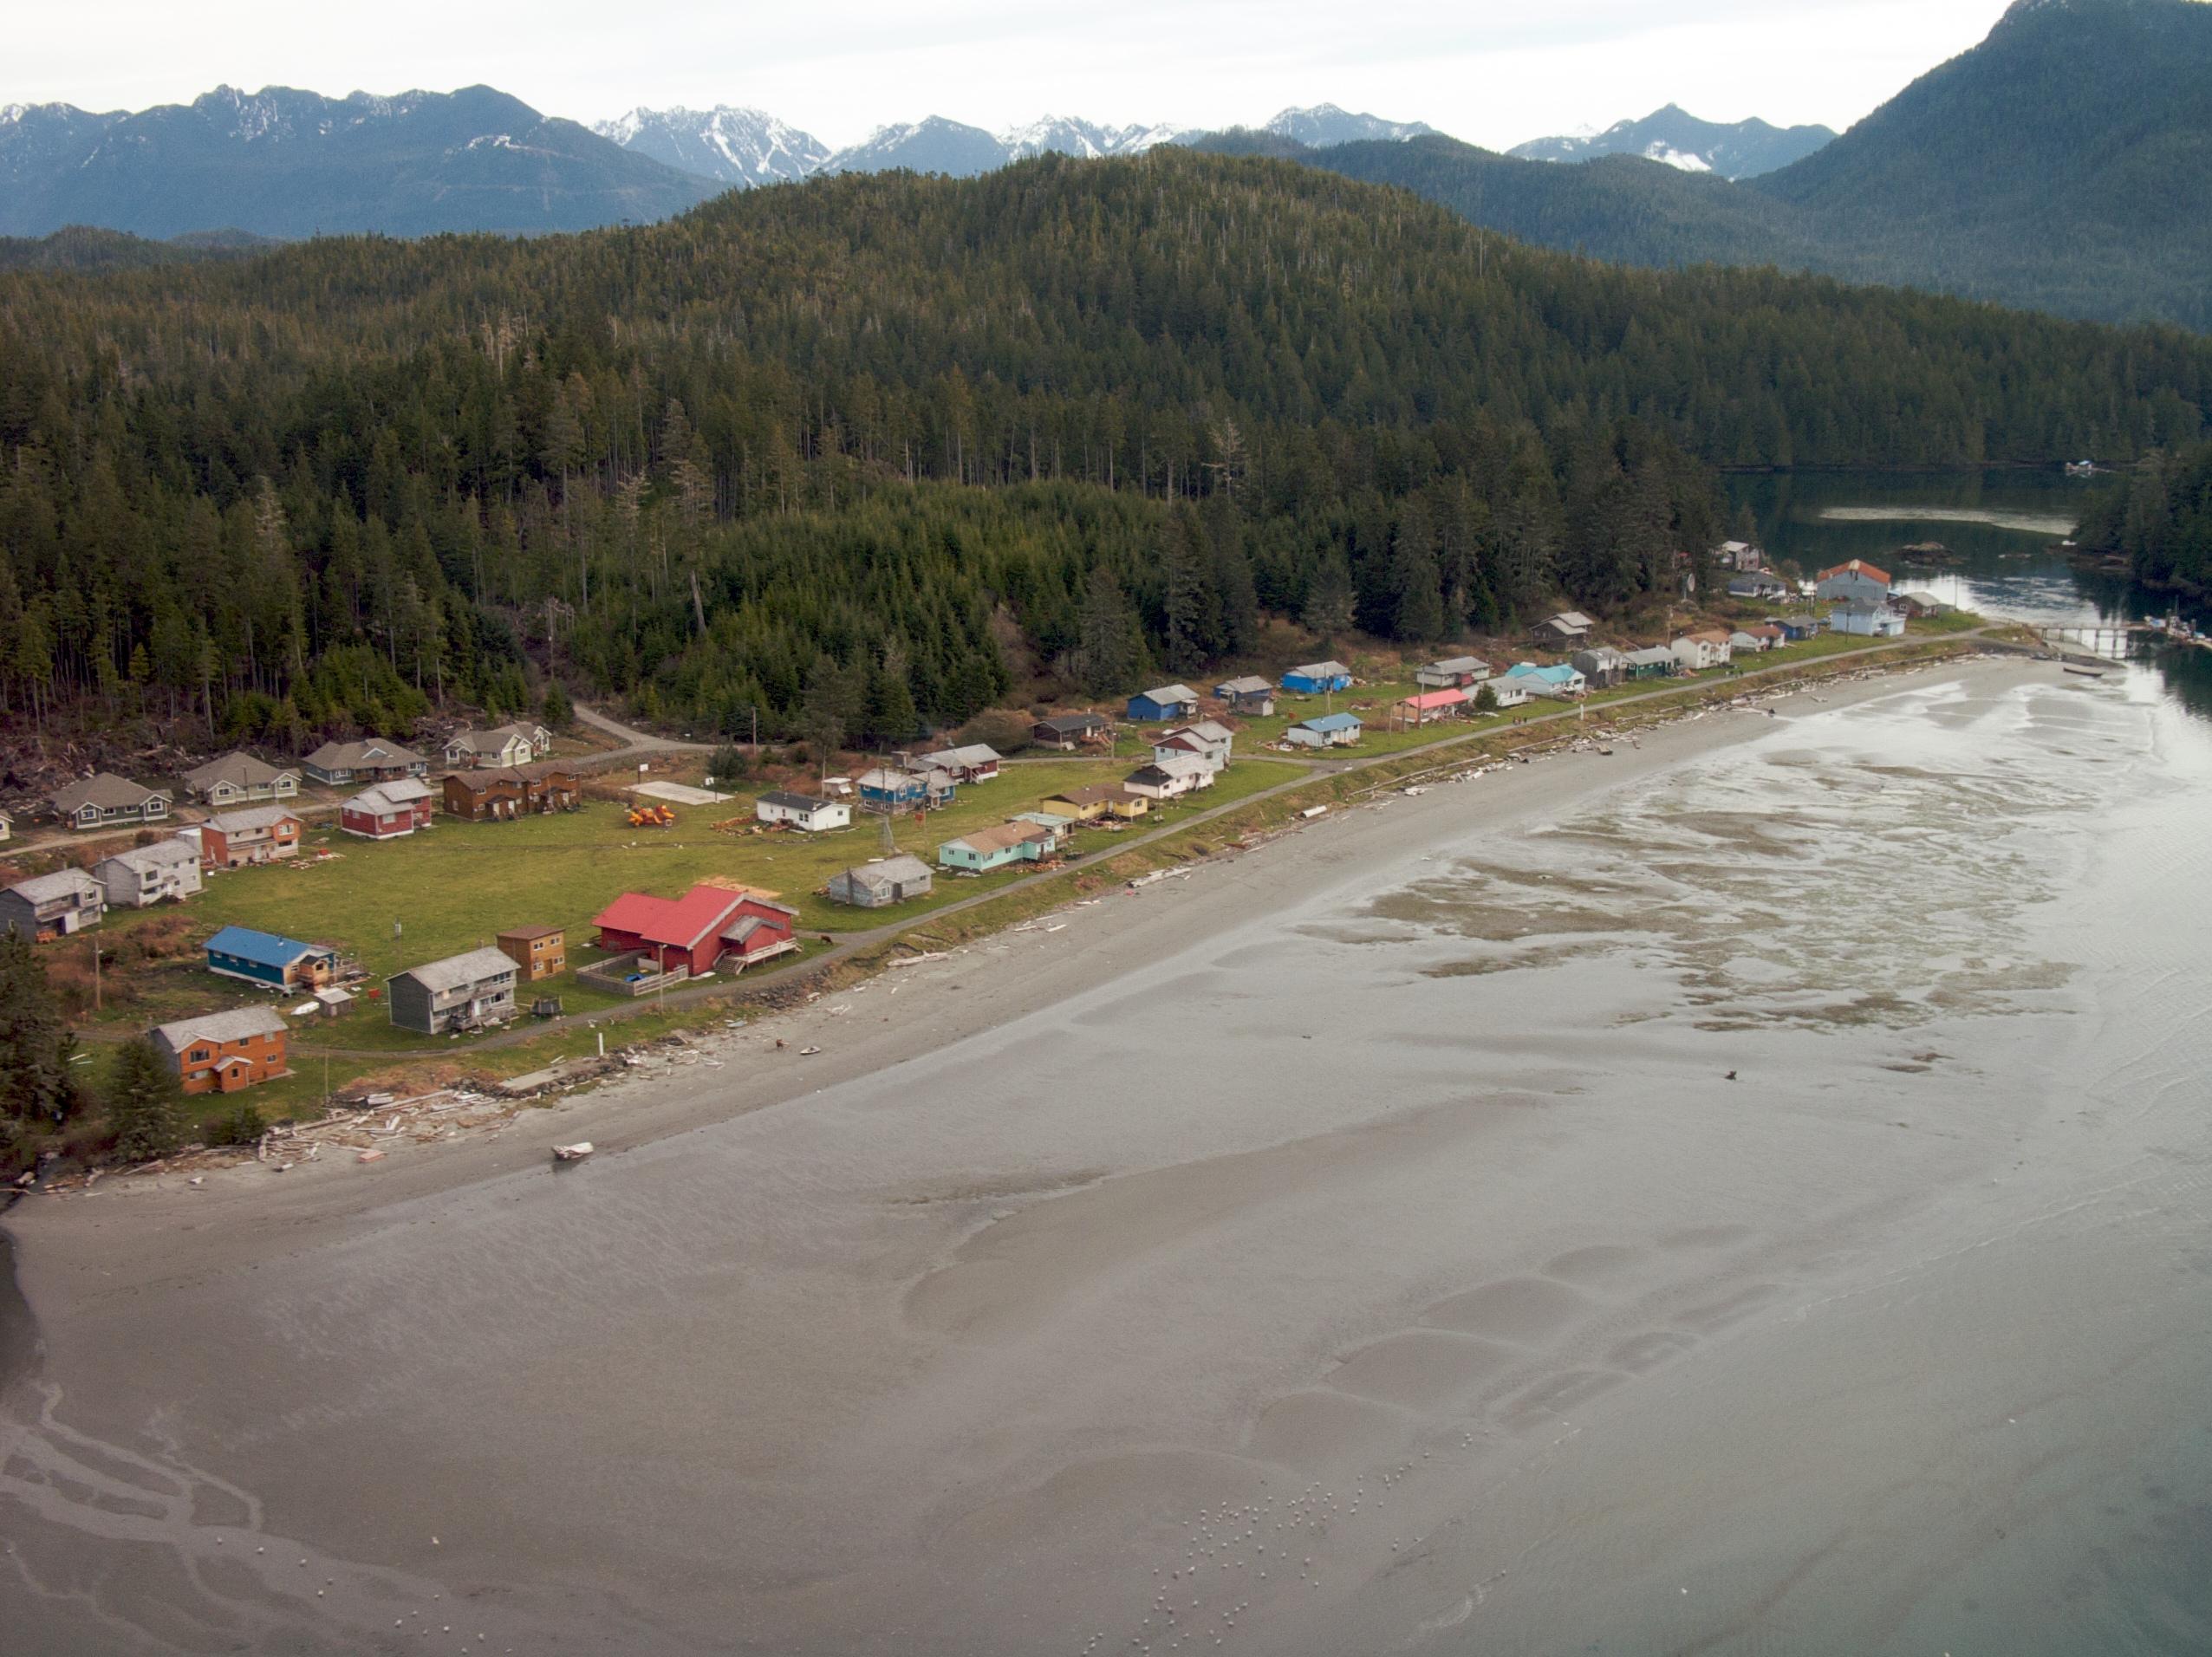 Opitsaht, Tla-o-qui-aht First Nation (2008)